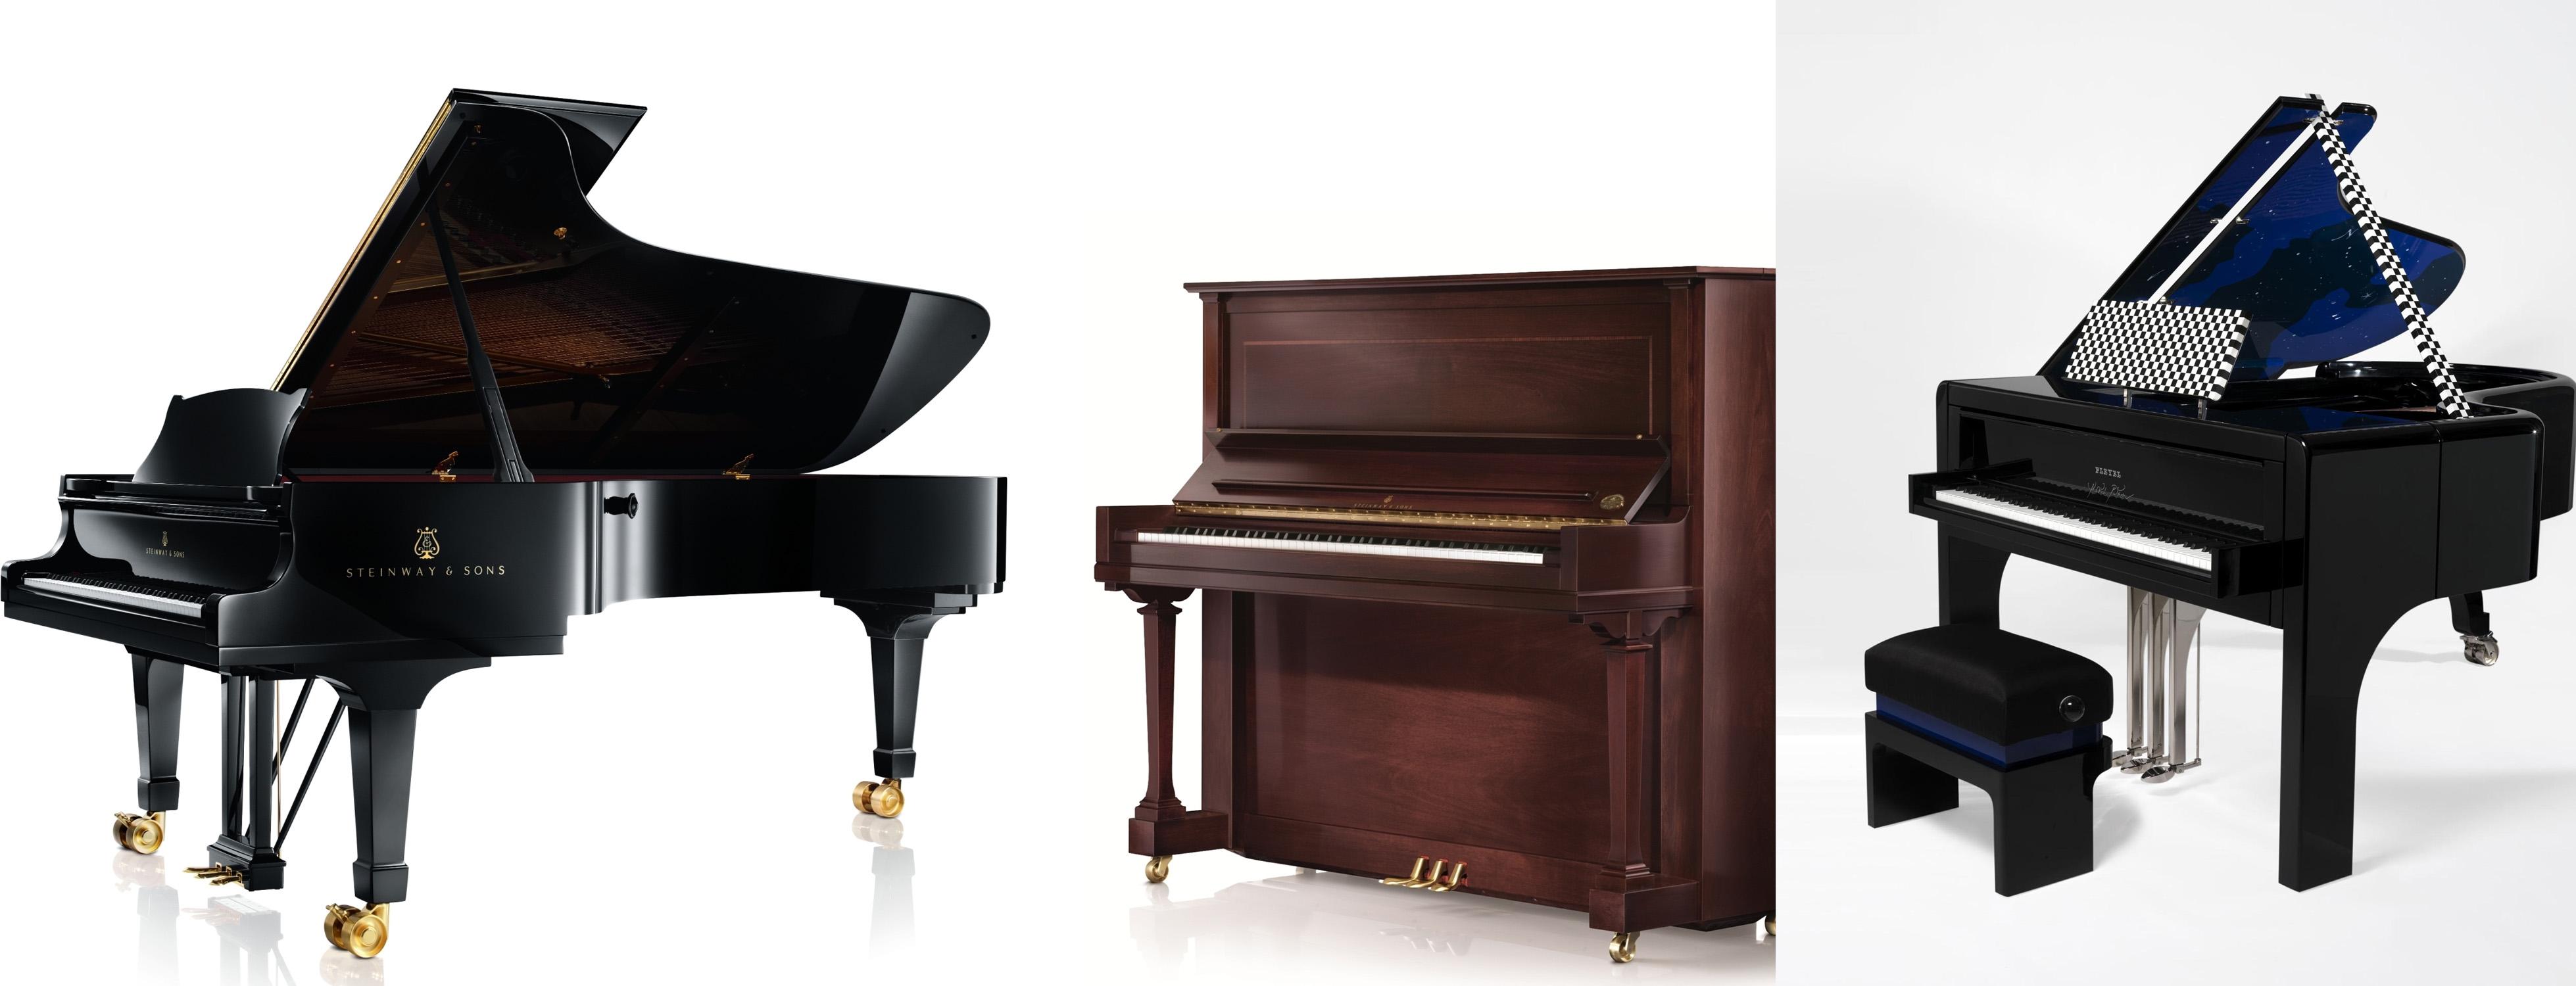 pianos d 39 occasion accord restauration transport location de piano en bretagne 56. Black Bedroom Furniture Sets. Home Design Ideas